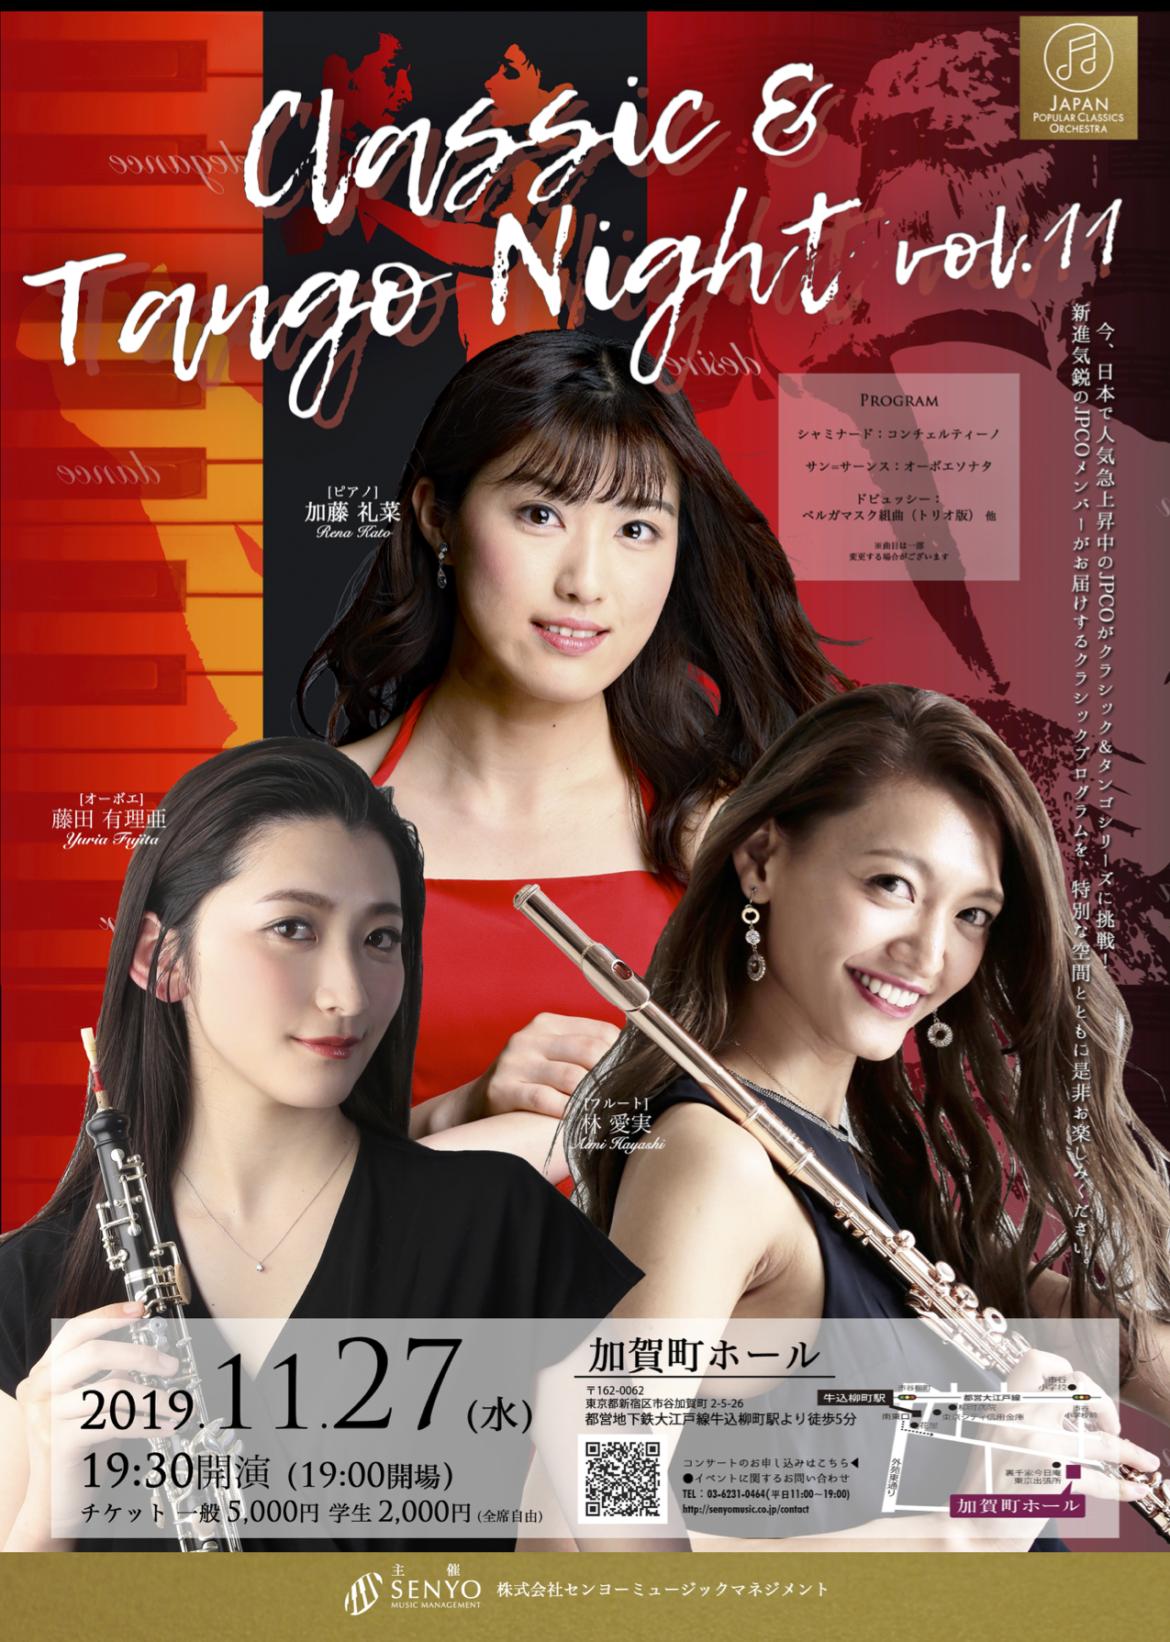 2019.11.27  JPCO CLASSIC & TANGO NIGHT  vol.11